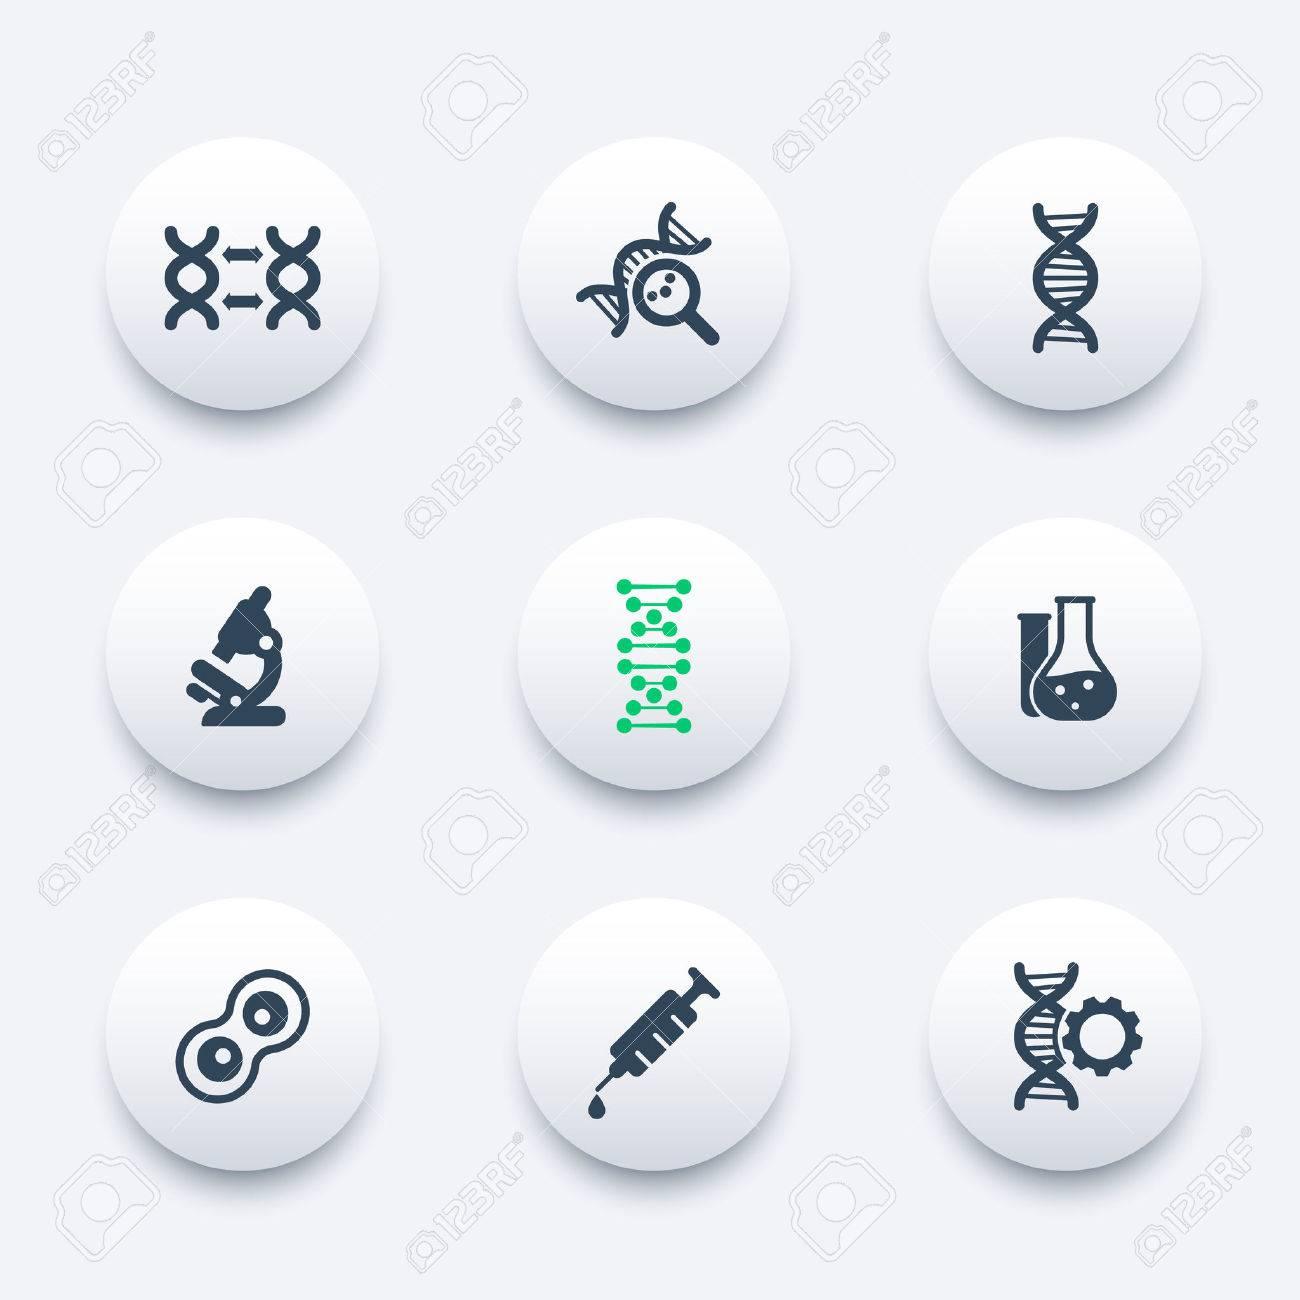 genetics icons dna chain pictogram genetic modification dna